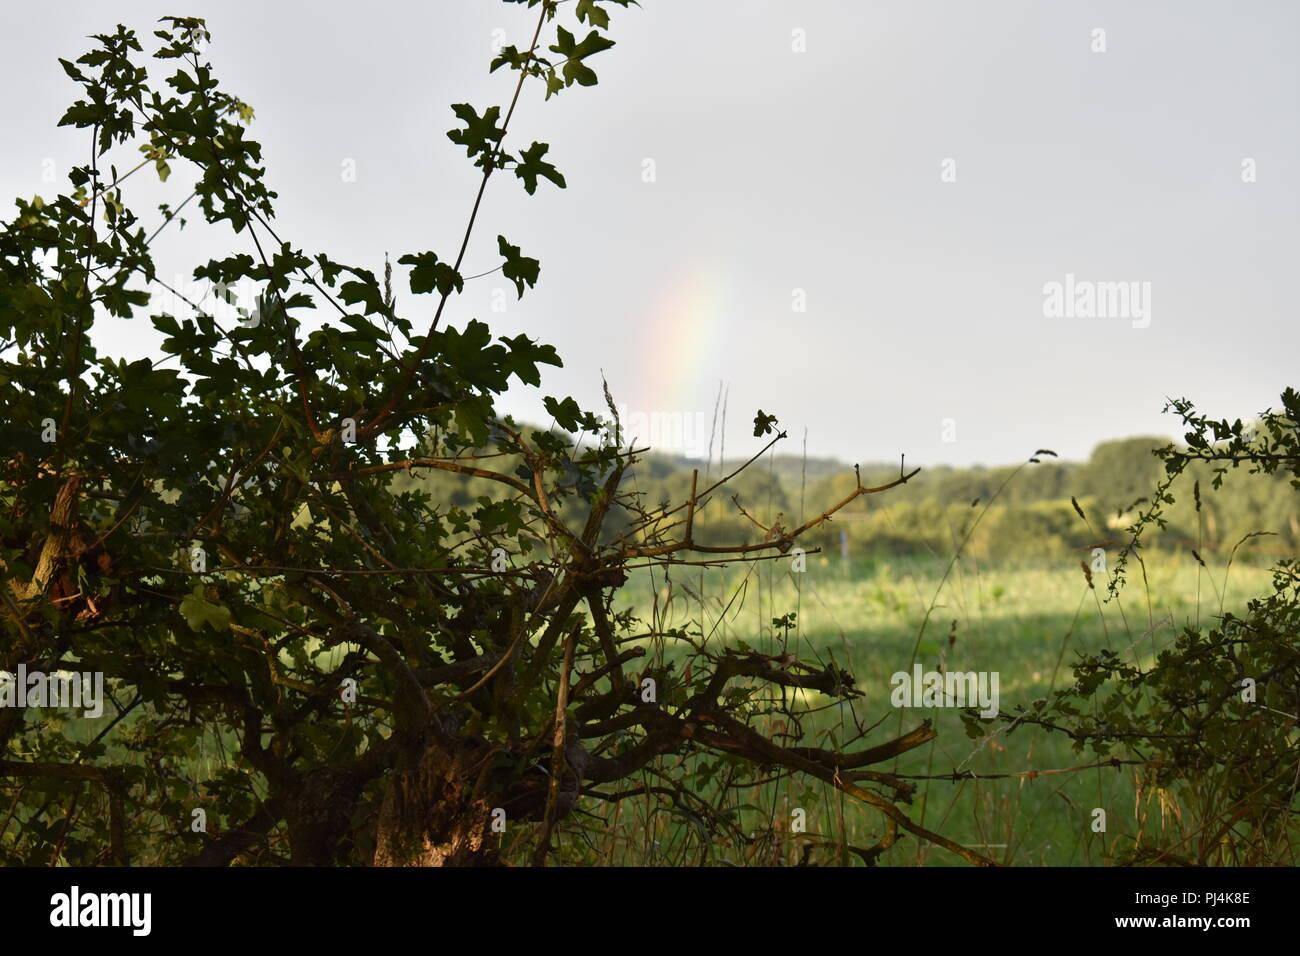 A rainbow over a rural farmland hedge - Stock Image